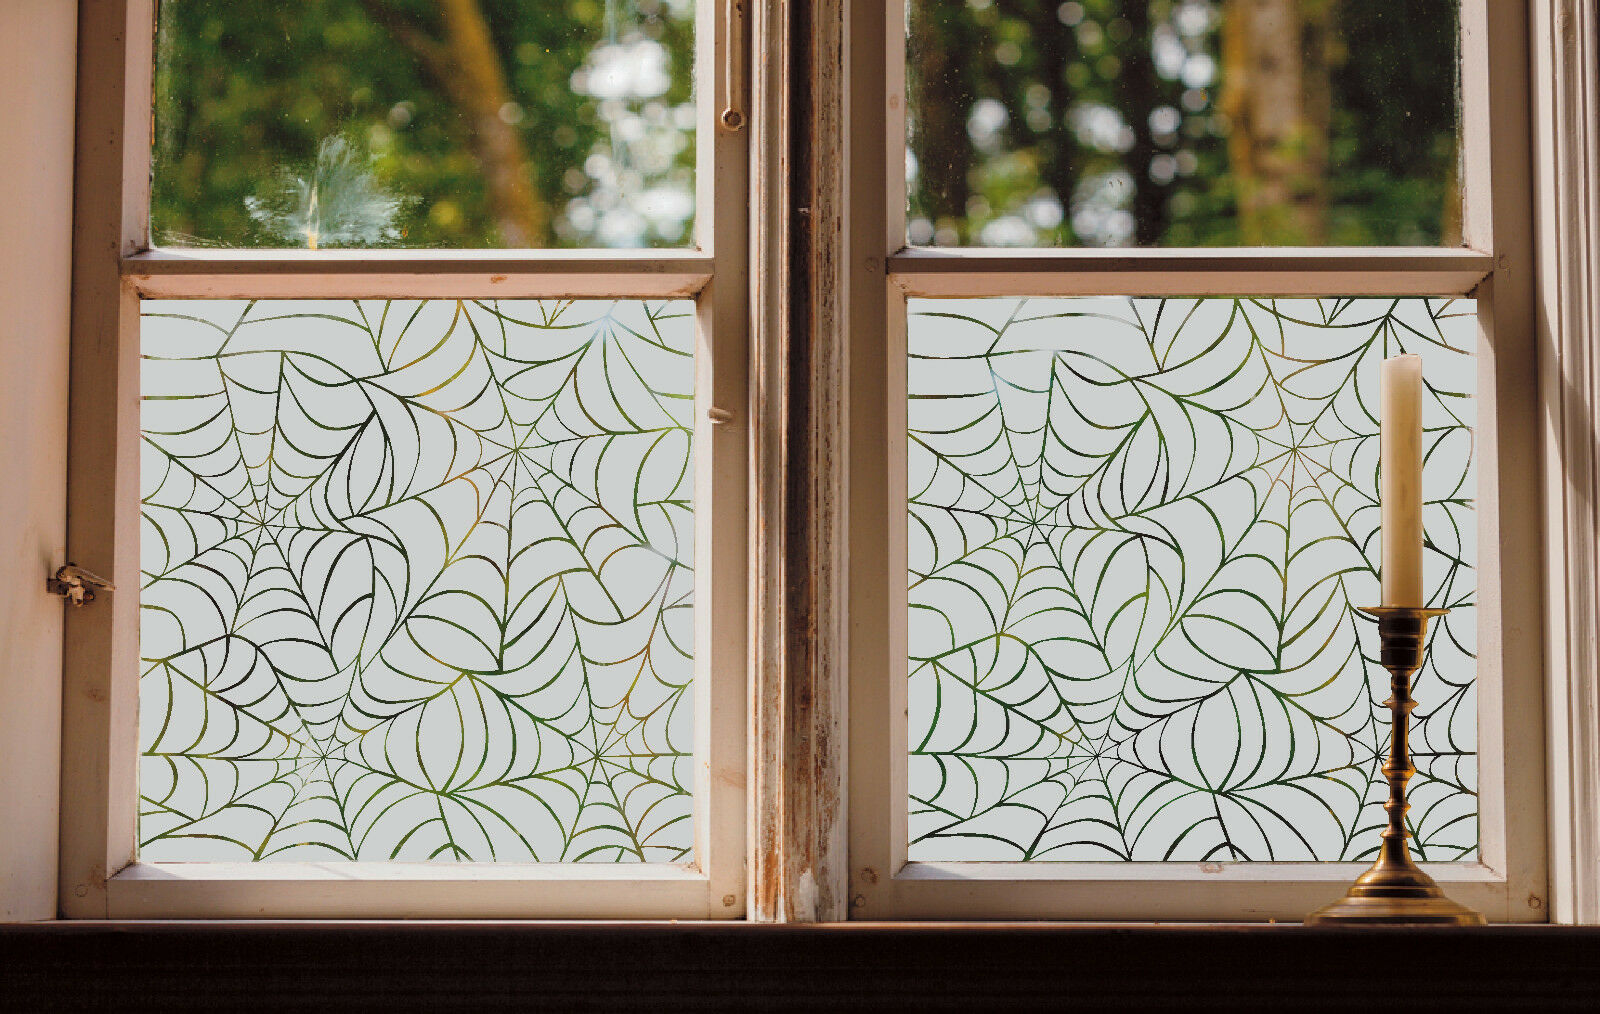 Ge tztes glas fenster folie matt spinnennetz gesch ft heim badezimmer contempory ebay - Badezimmer fenster glas ...